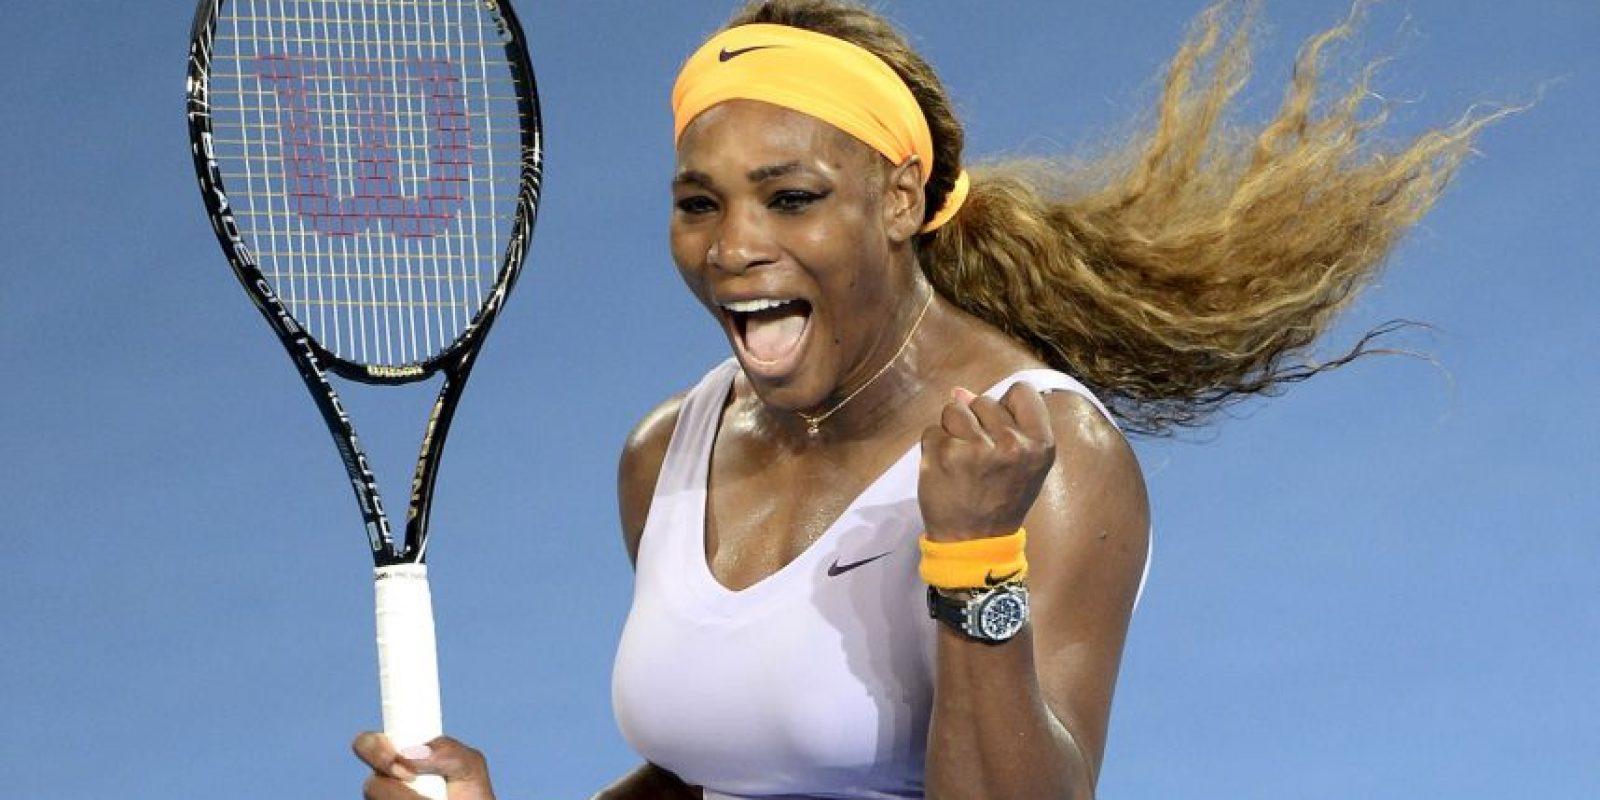 20. Serena Williams / Tenis Foto:Getty Images